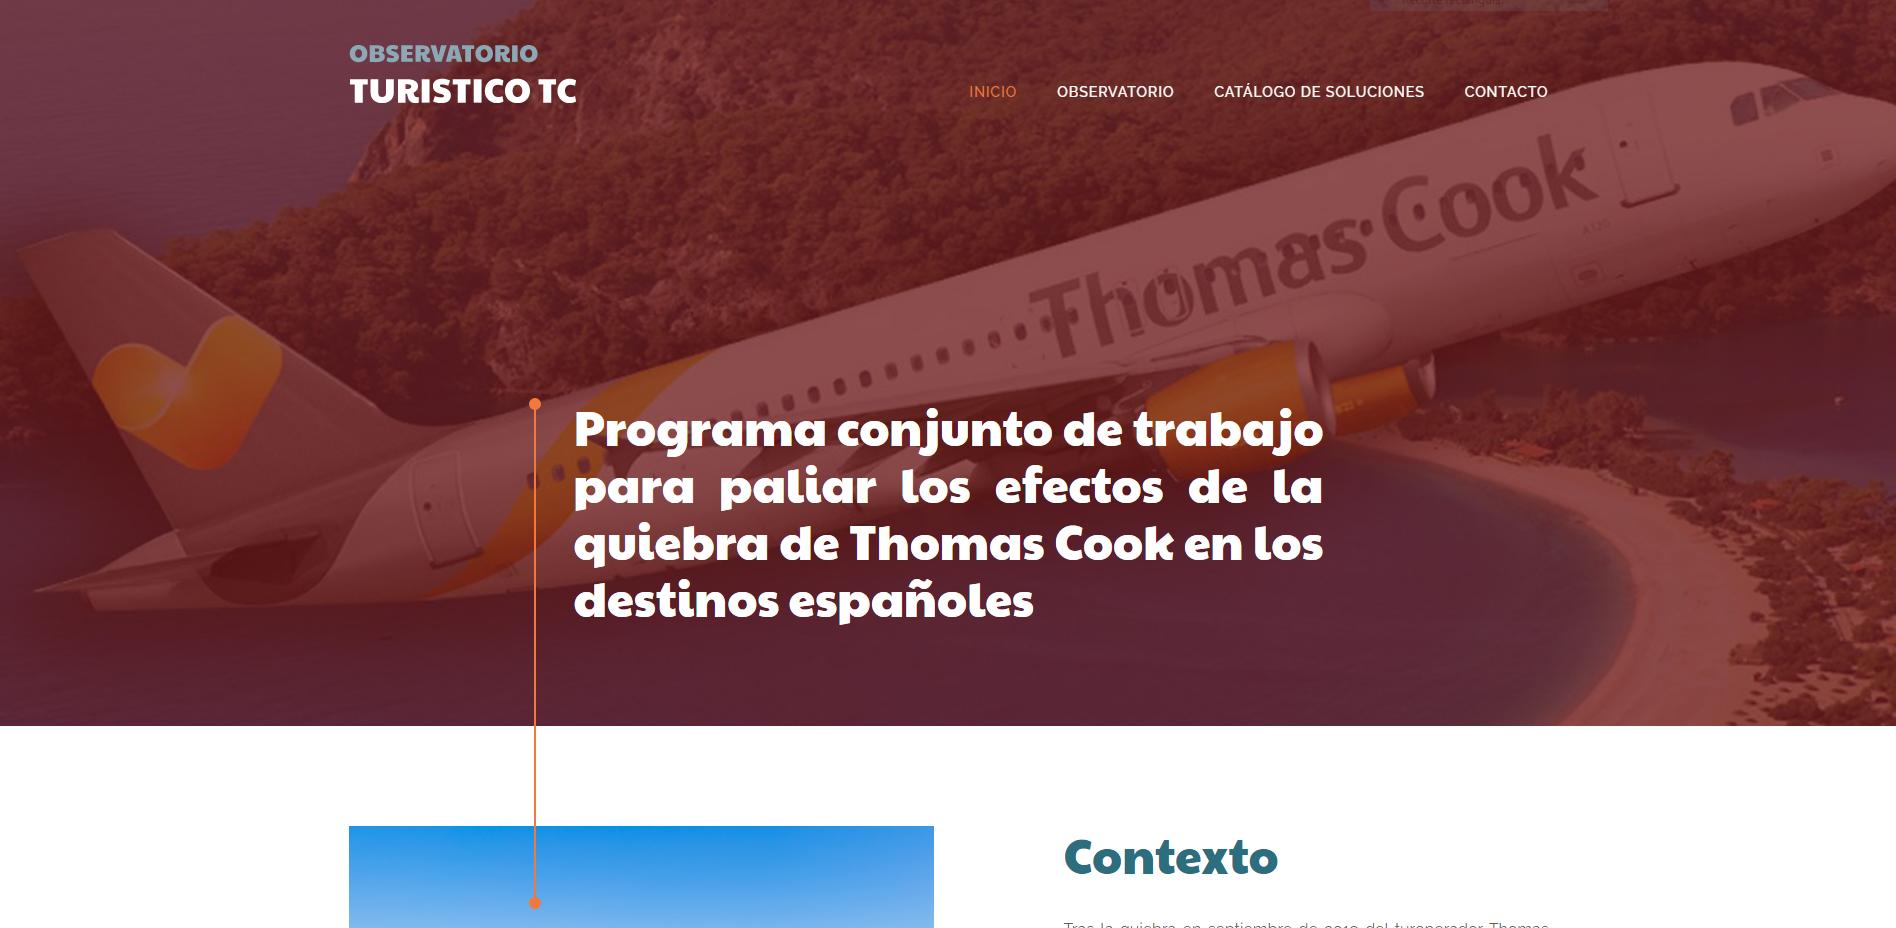 Captura Web Observatorio Turistico TC